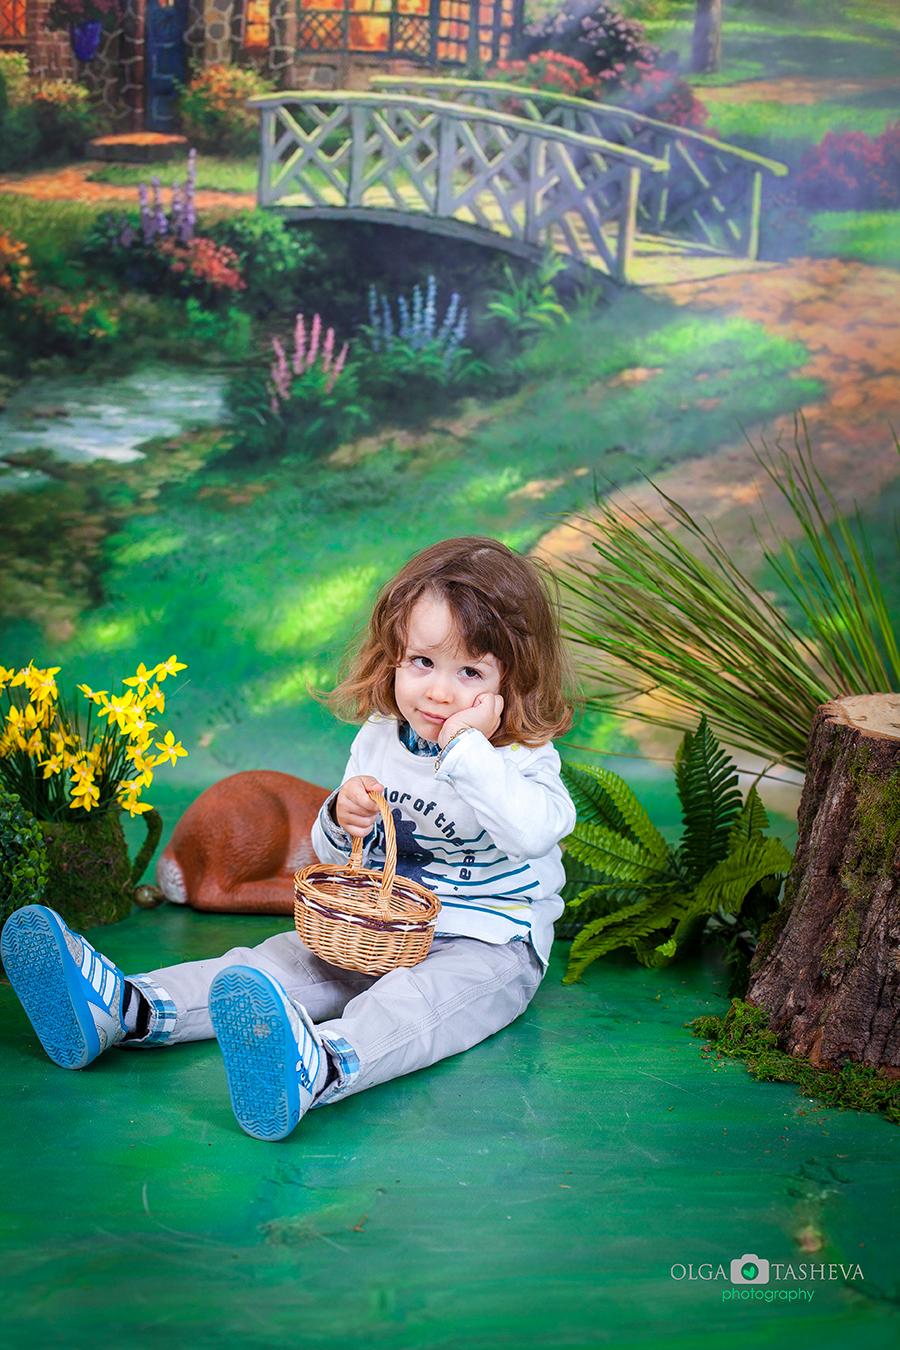 Детска фотосесия на Росиян при фотограф Олга Ташева. Фото студио Варна. Детска, бебешка и семейна фотография. Фотограф Варна - 23323